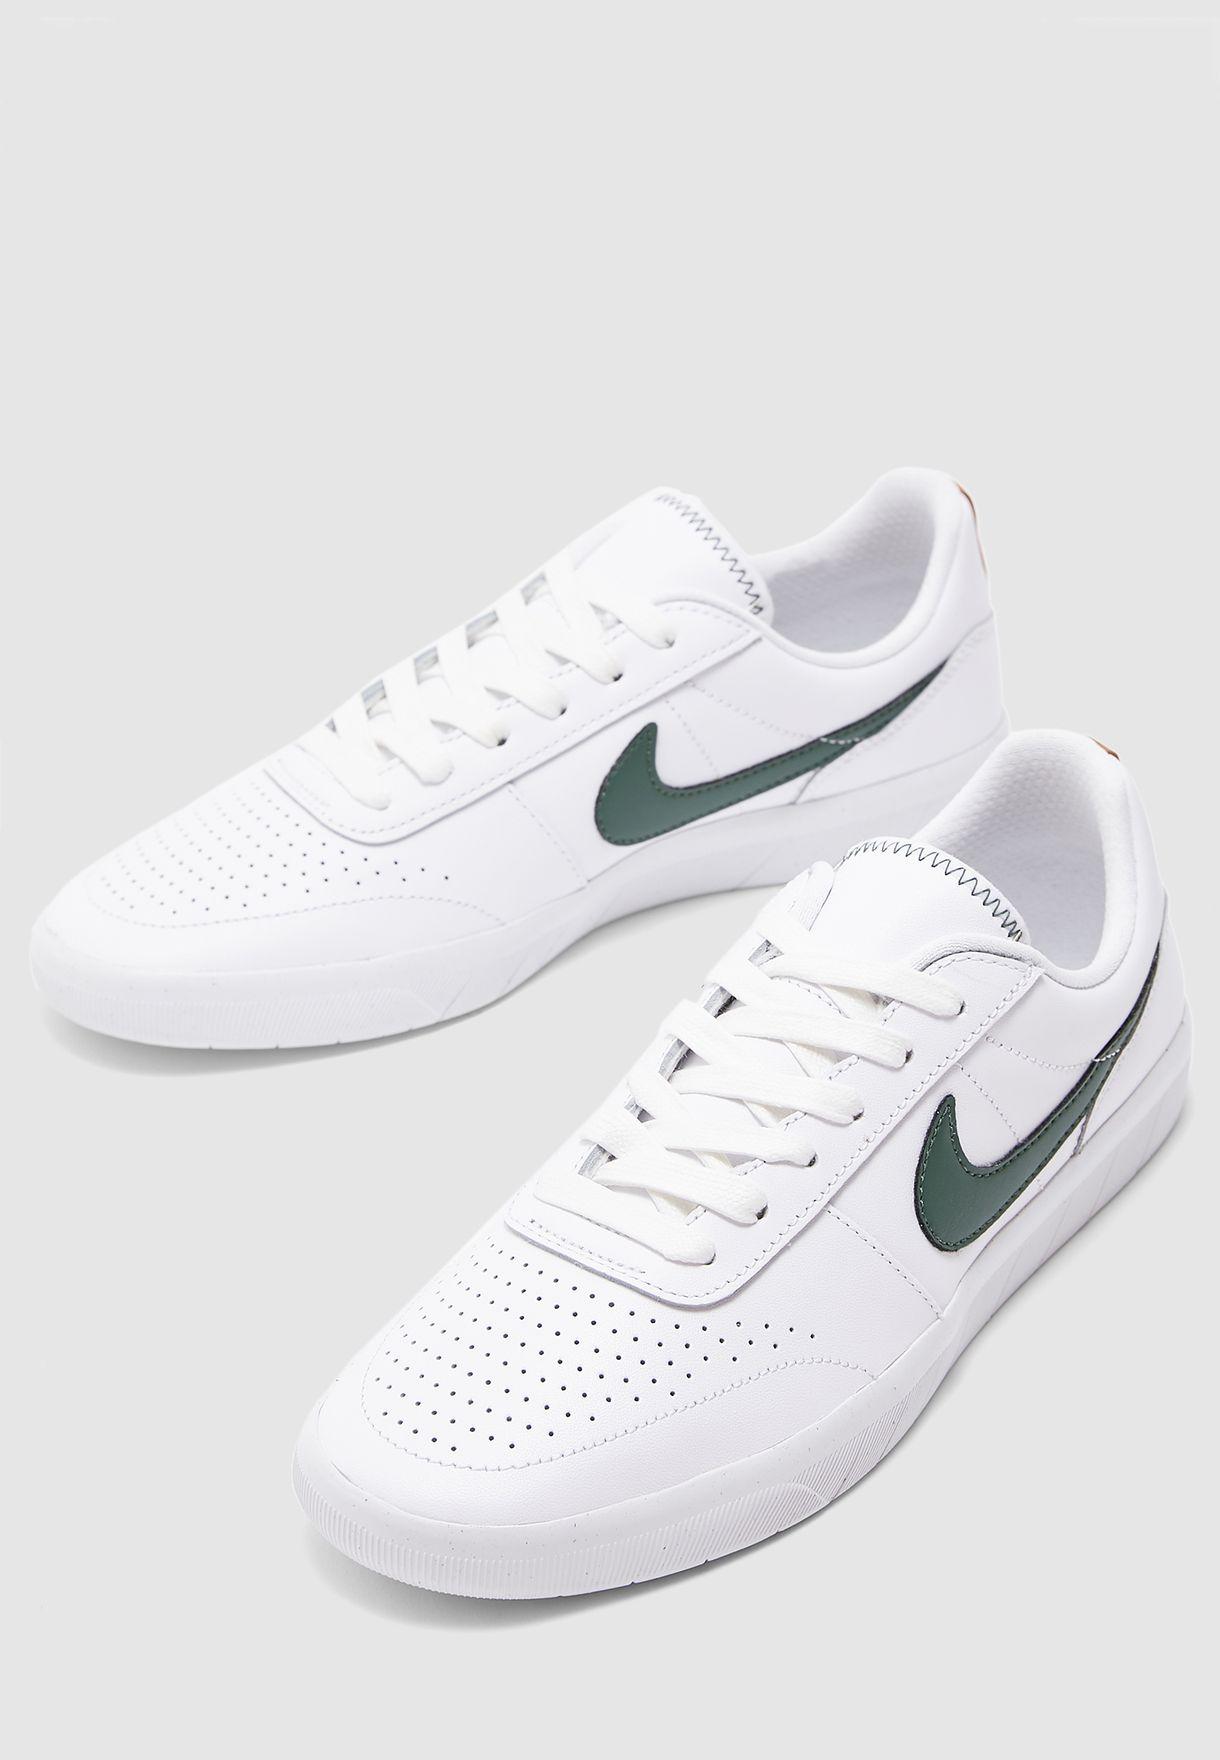 promedio transacción el primero  Buy Nike white SB Team Classic PRM for Men in MENA, Worldwide | AR0767-101